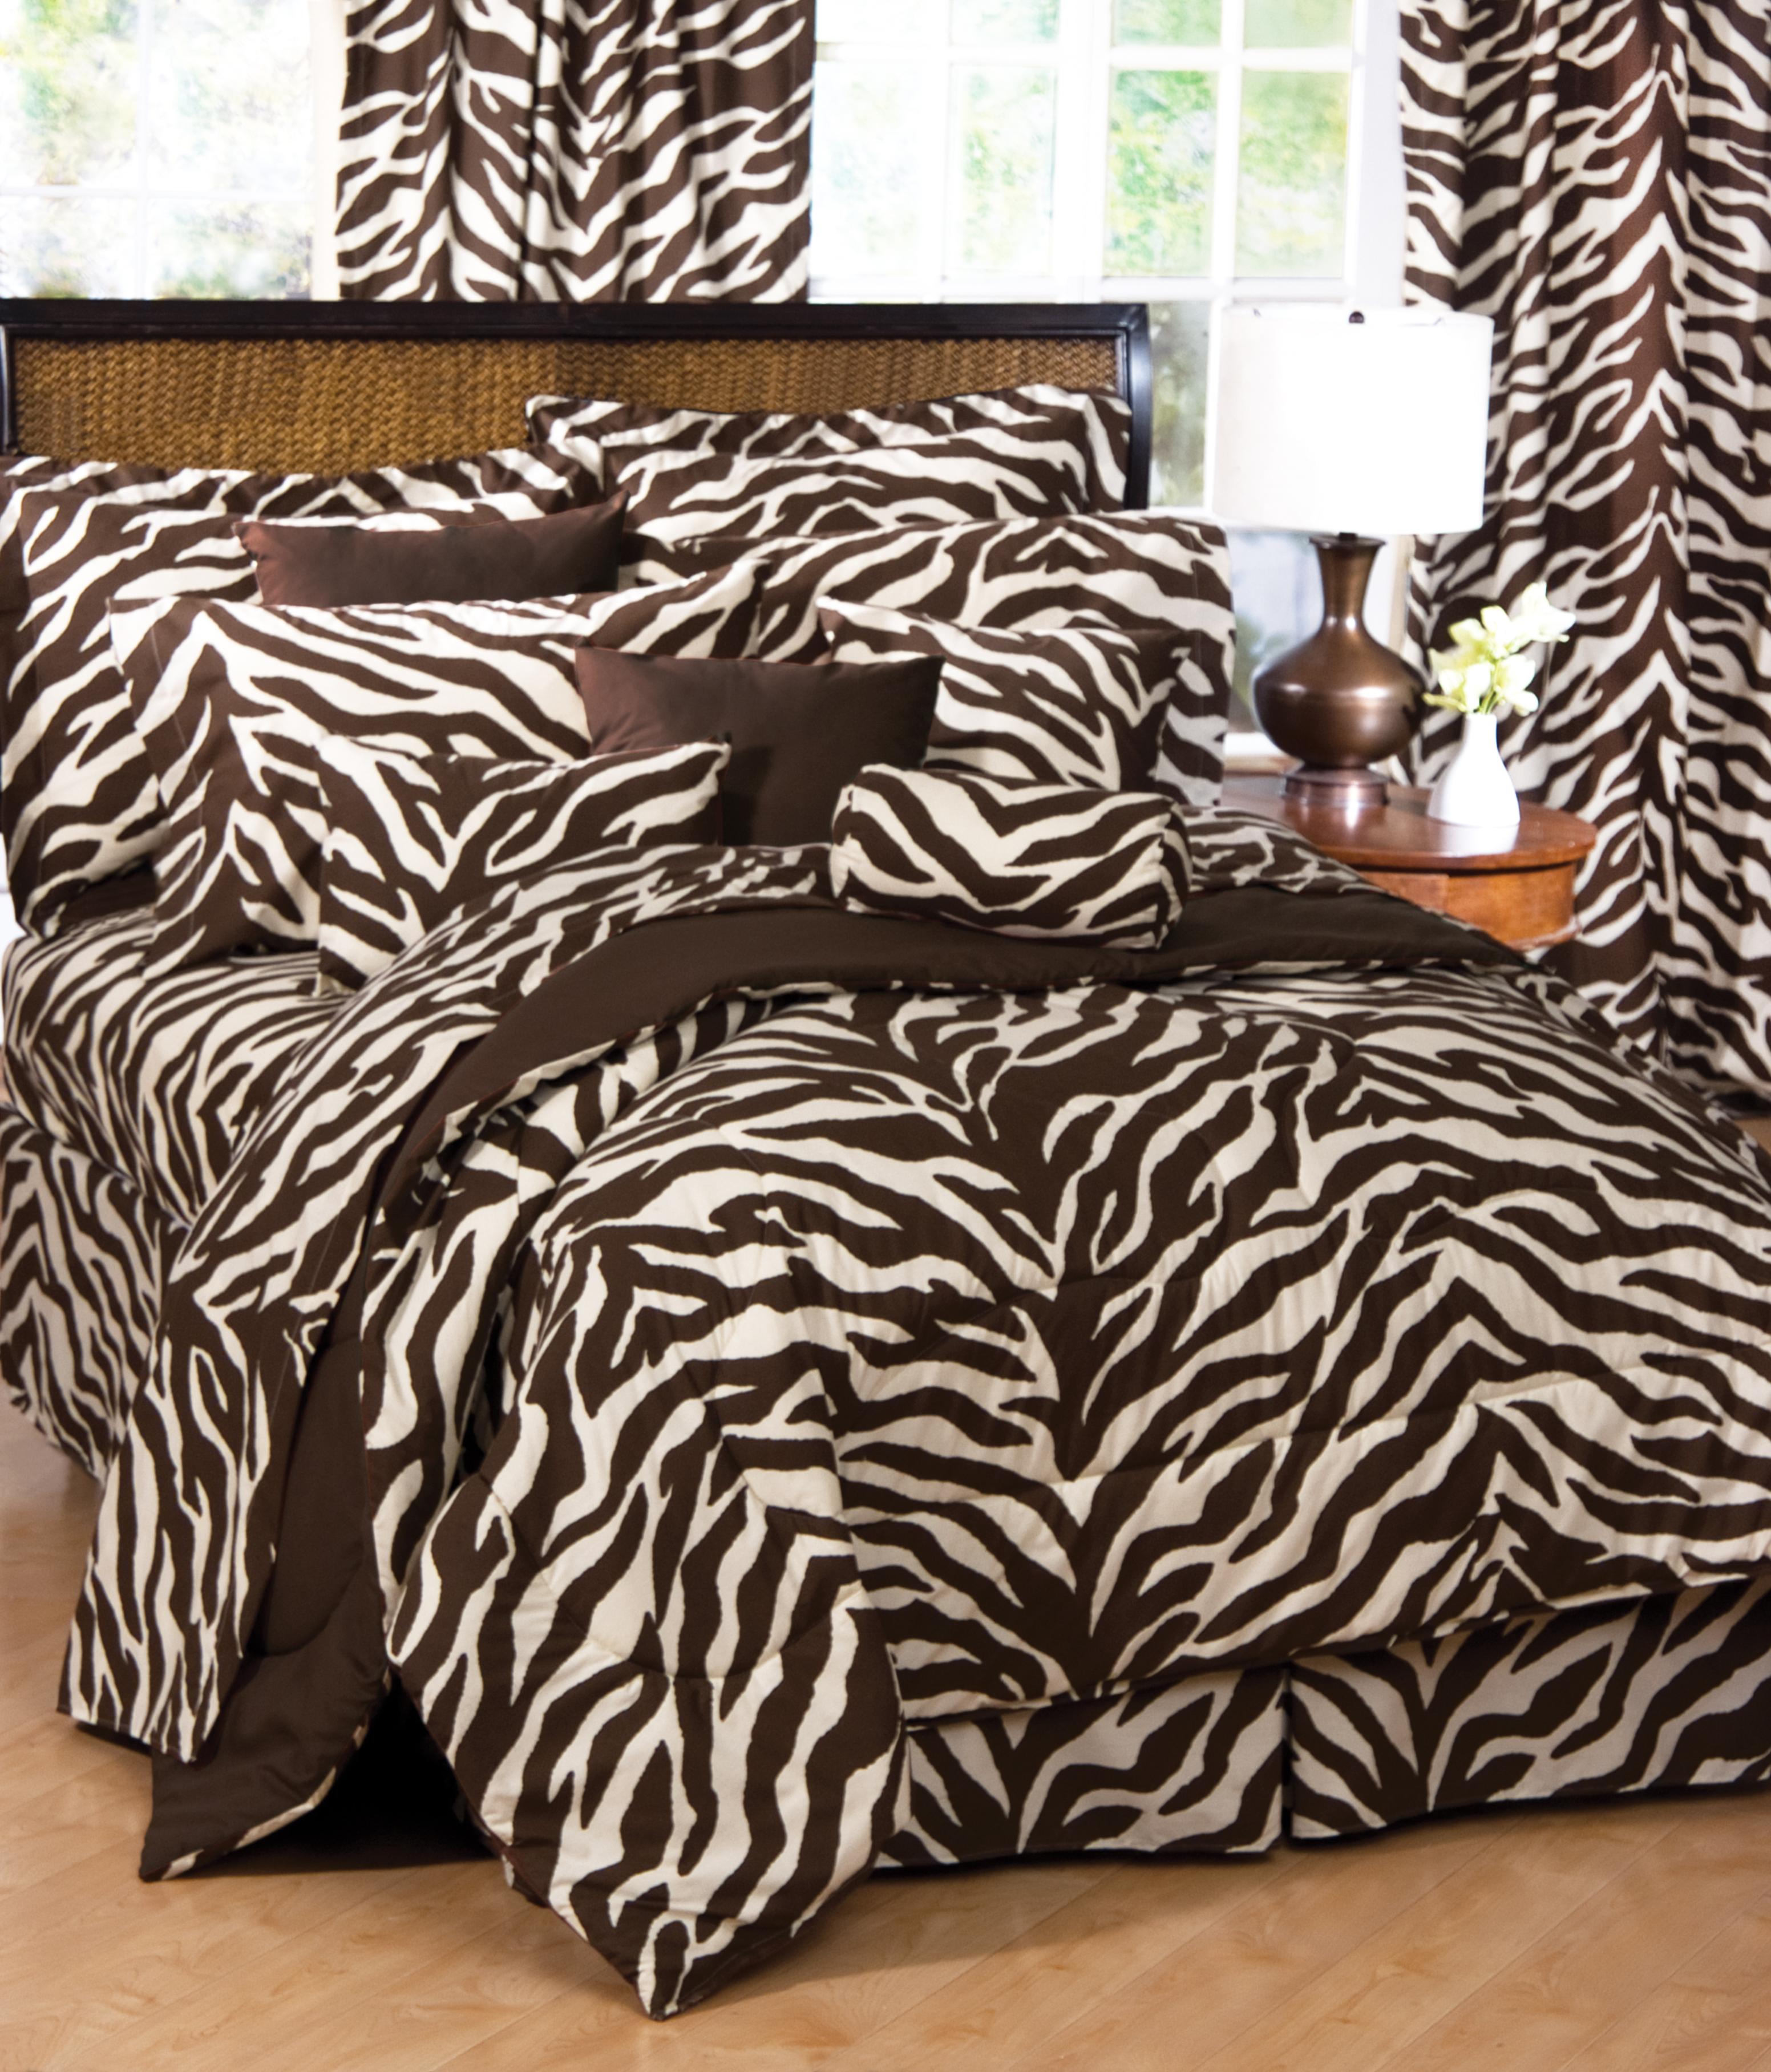 Brown zebra print bed set interiordecorating Zebra print bedding